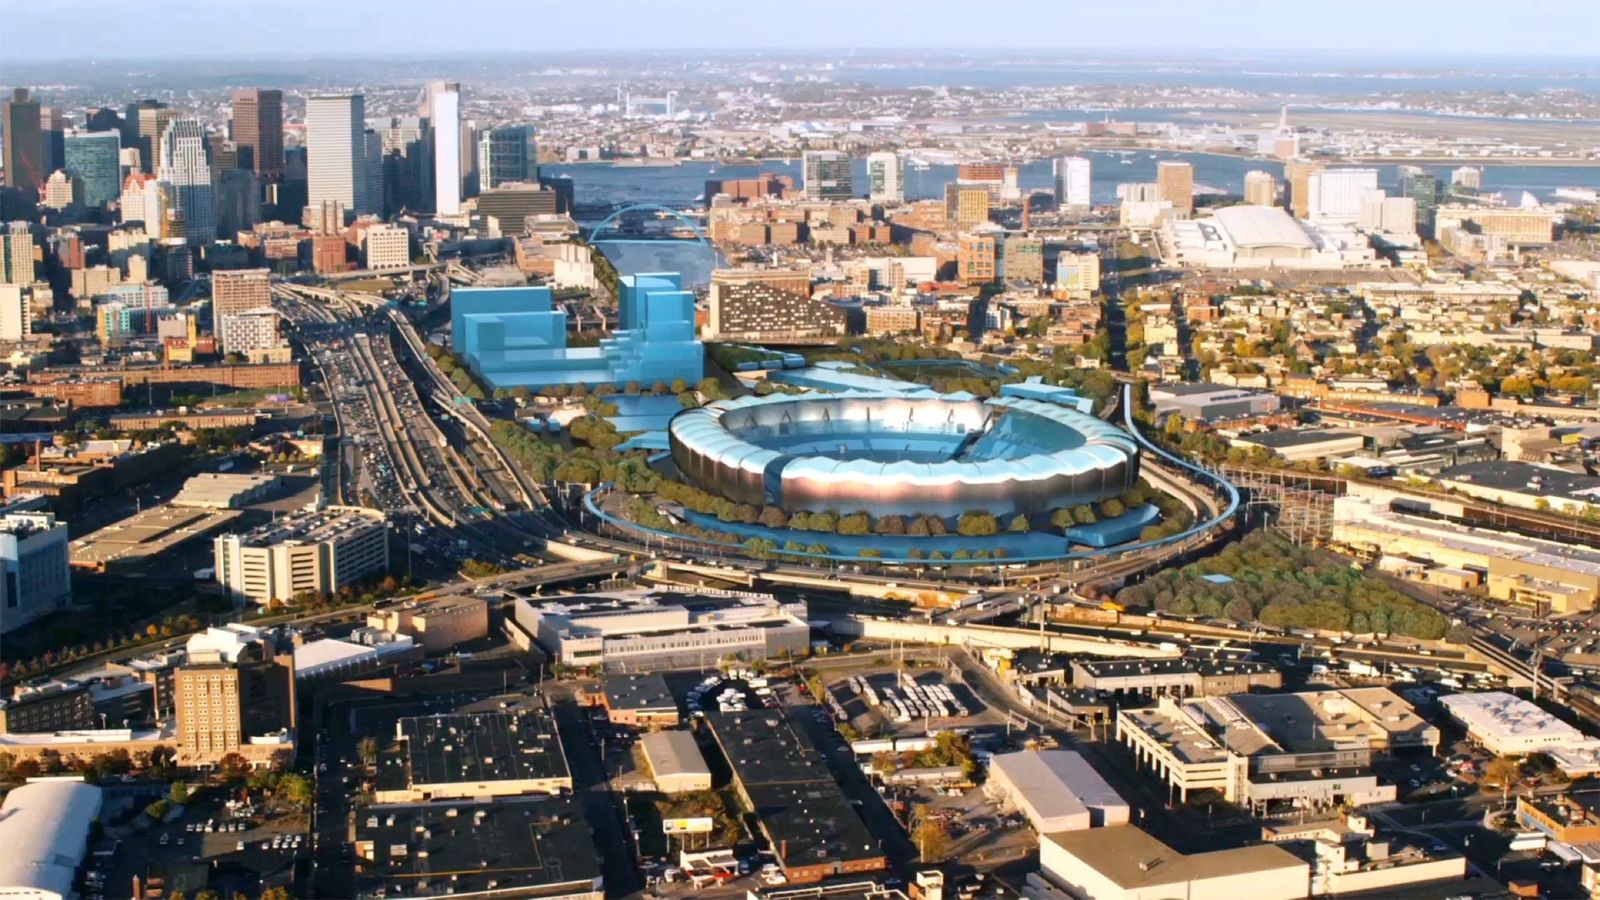 OLYMPICS-USA/BOSTON